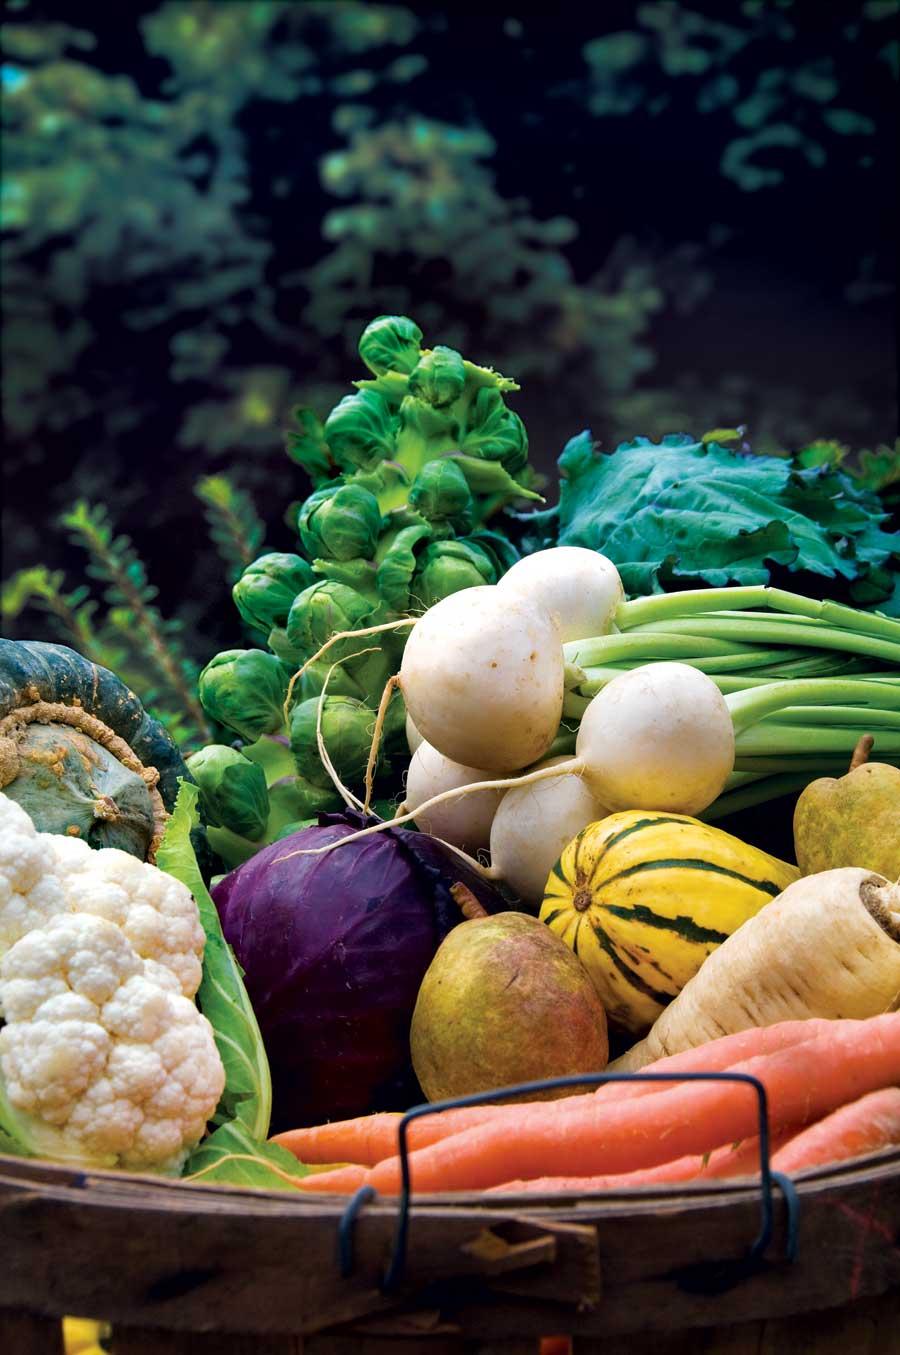 gardeners in southern hemisphere preparing your vegetable garden